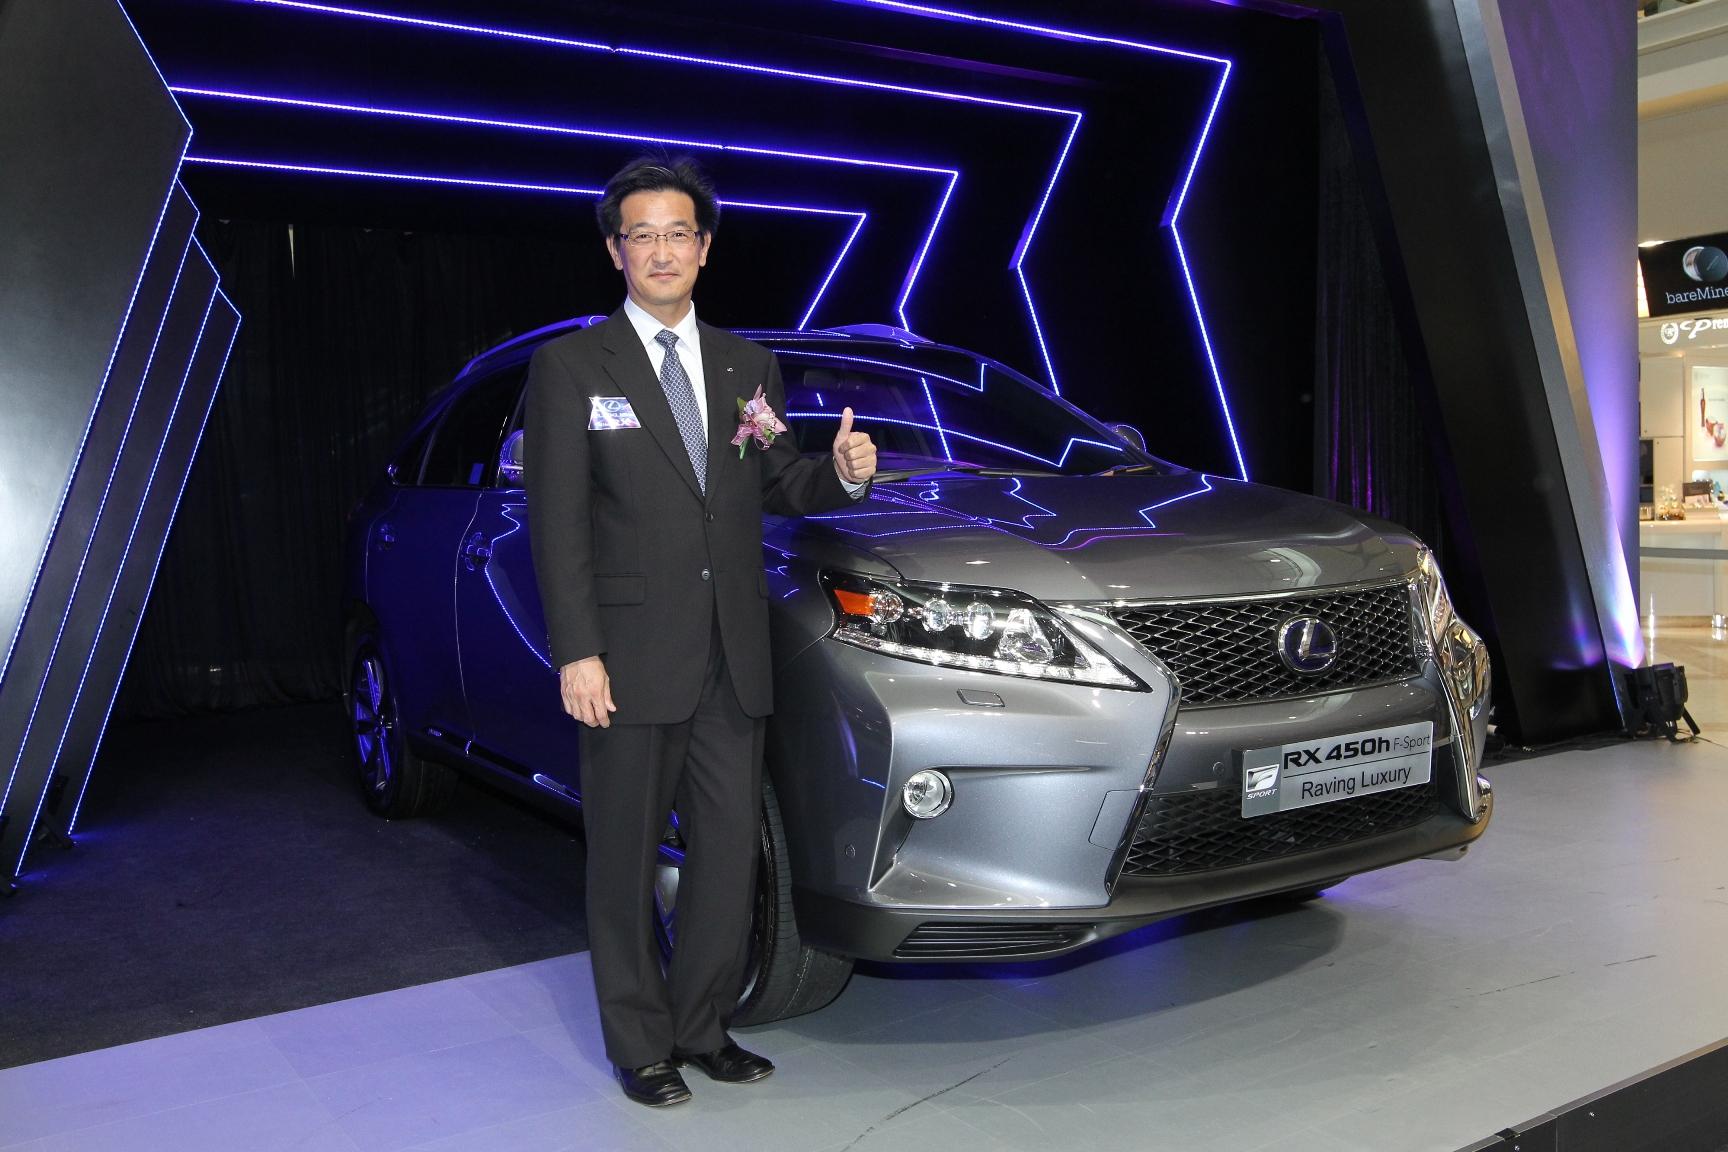 RX Launch_1_Lexus RX首席工程師勝田隆之先生.JPG